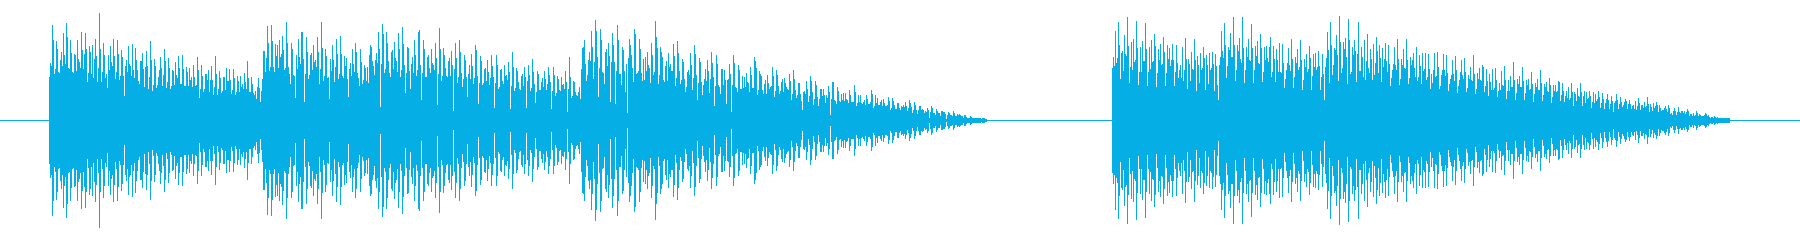 GB風アクションゲームのジングルの再生済みの波形